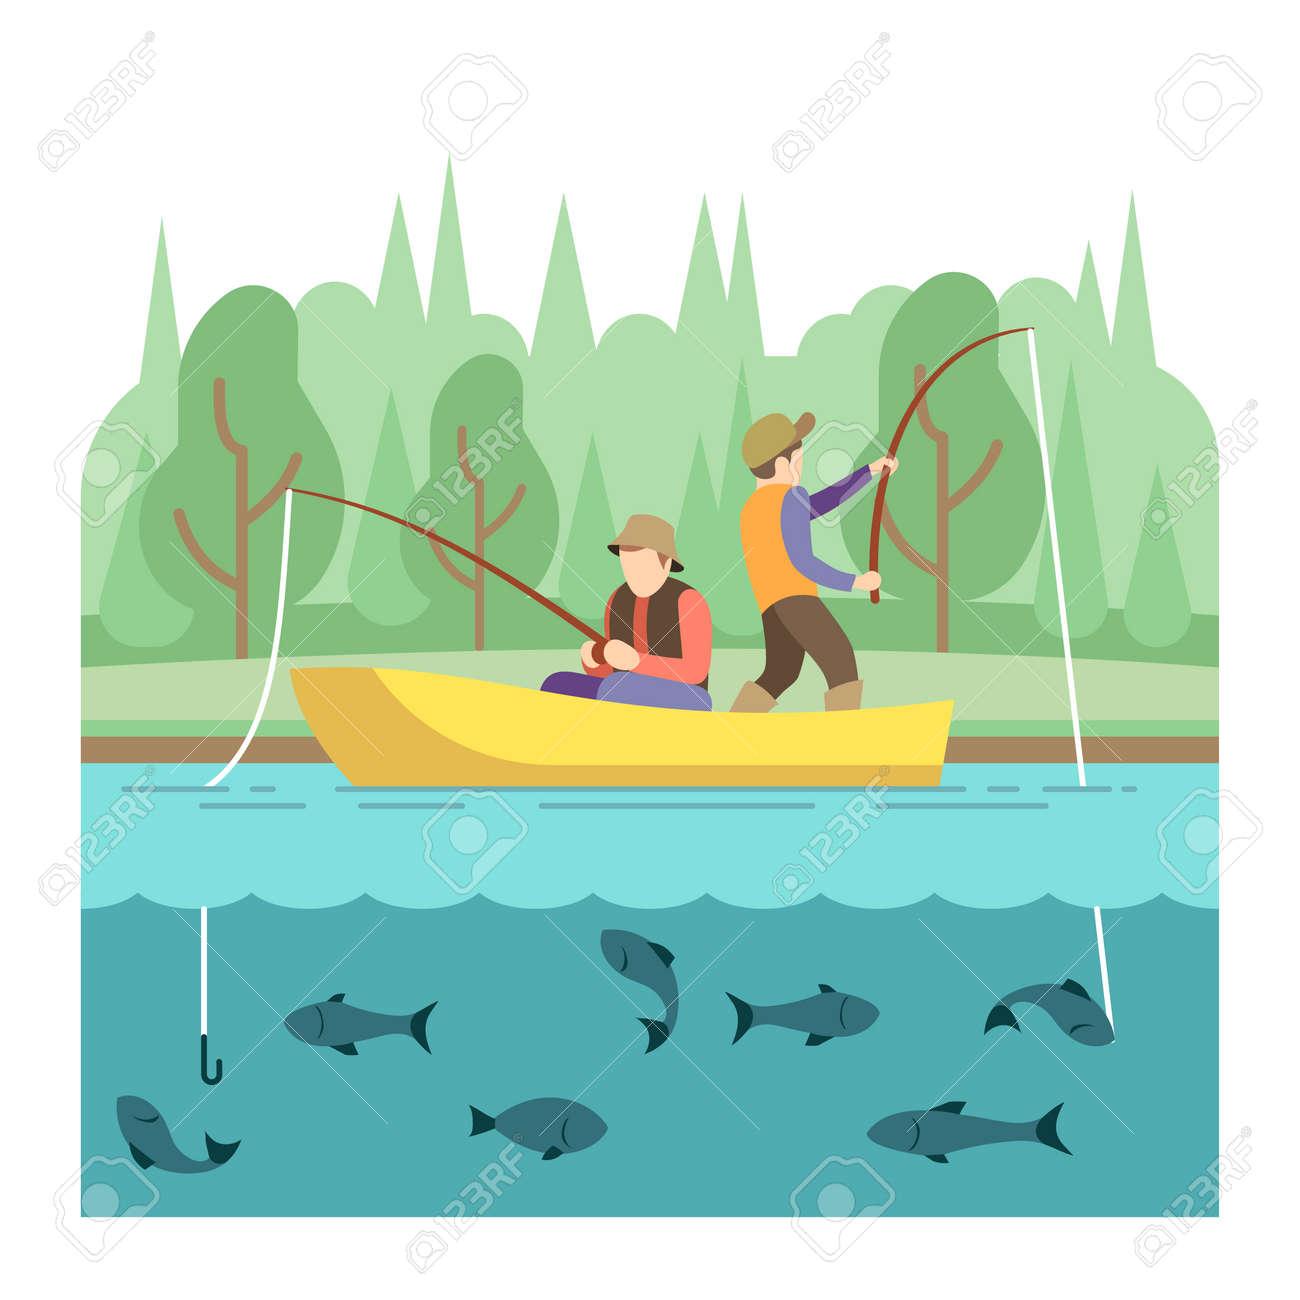 Outdoor summer activities. Fishing sport vector concept. Summer vacation fishing, illustration outdoor river boat - 166830243